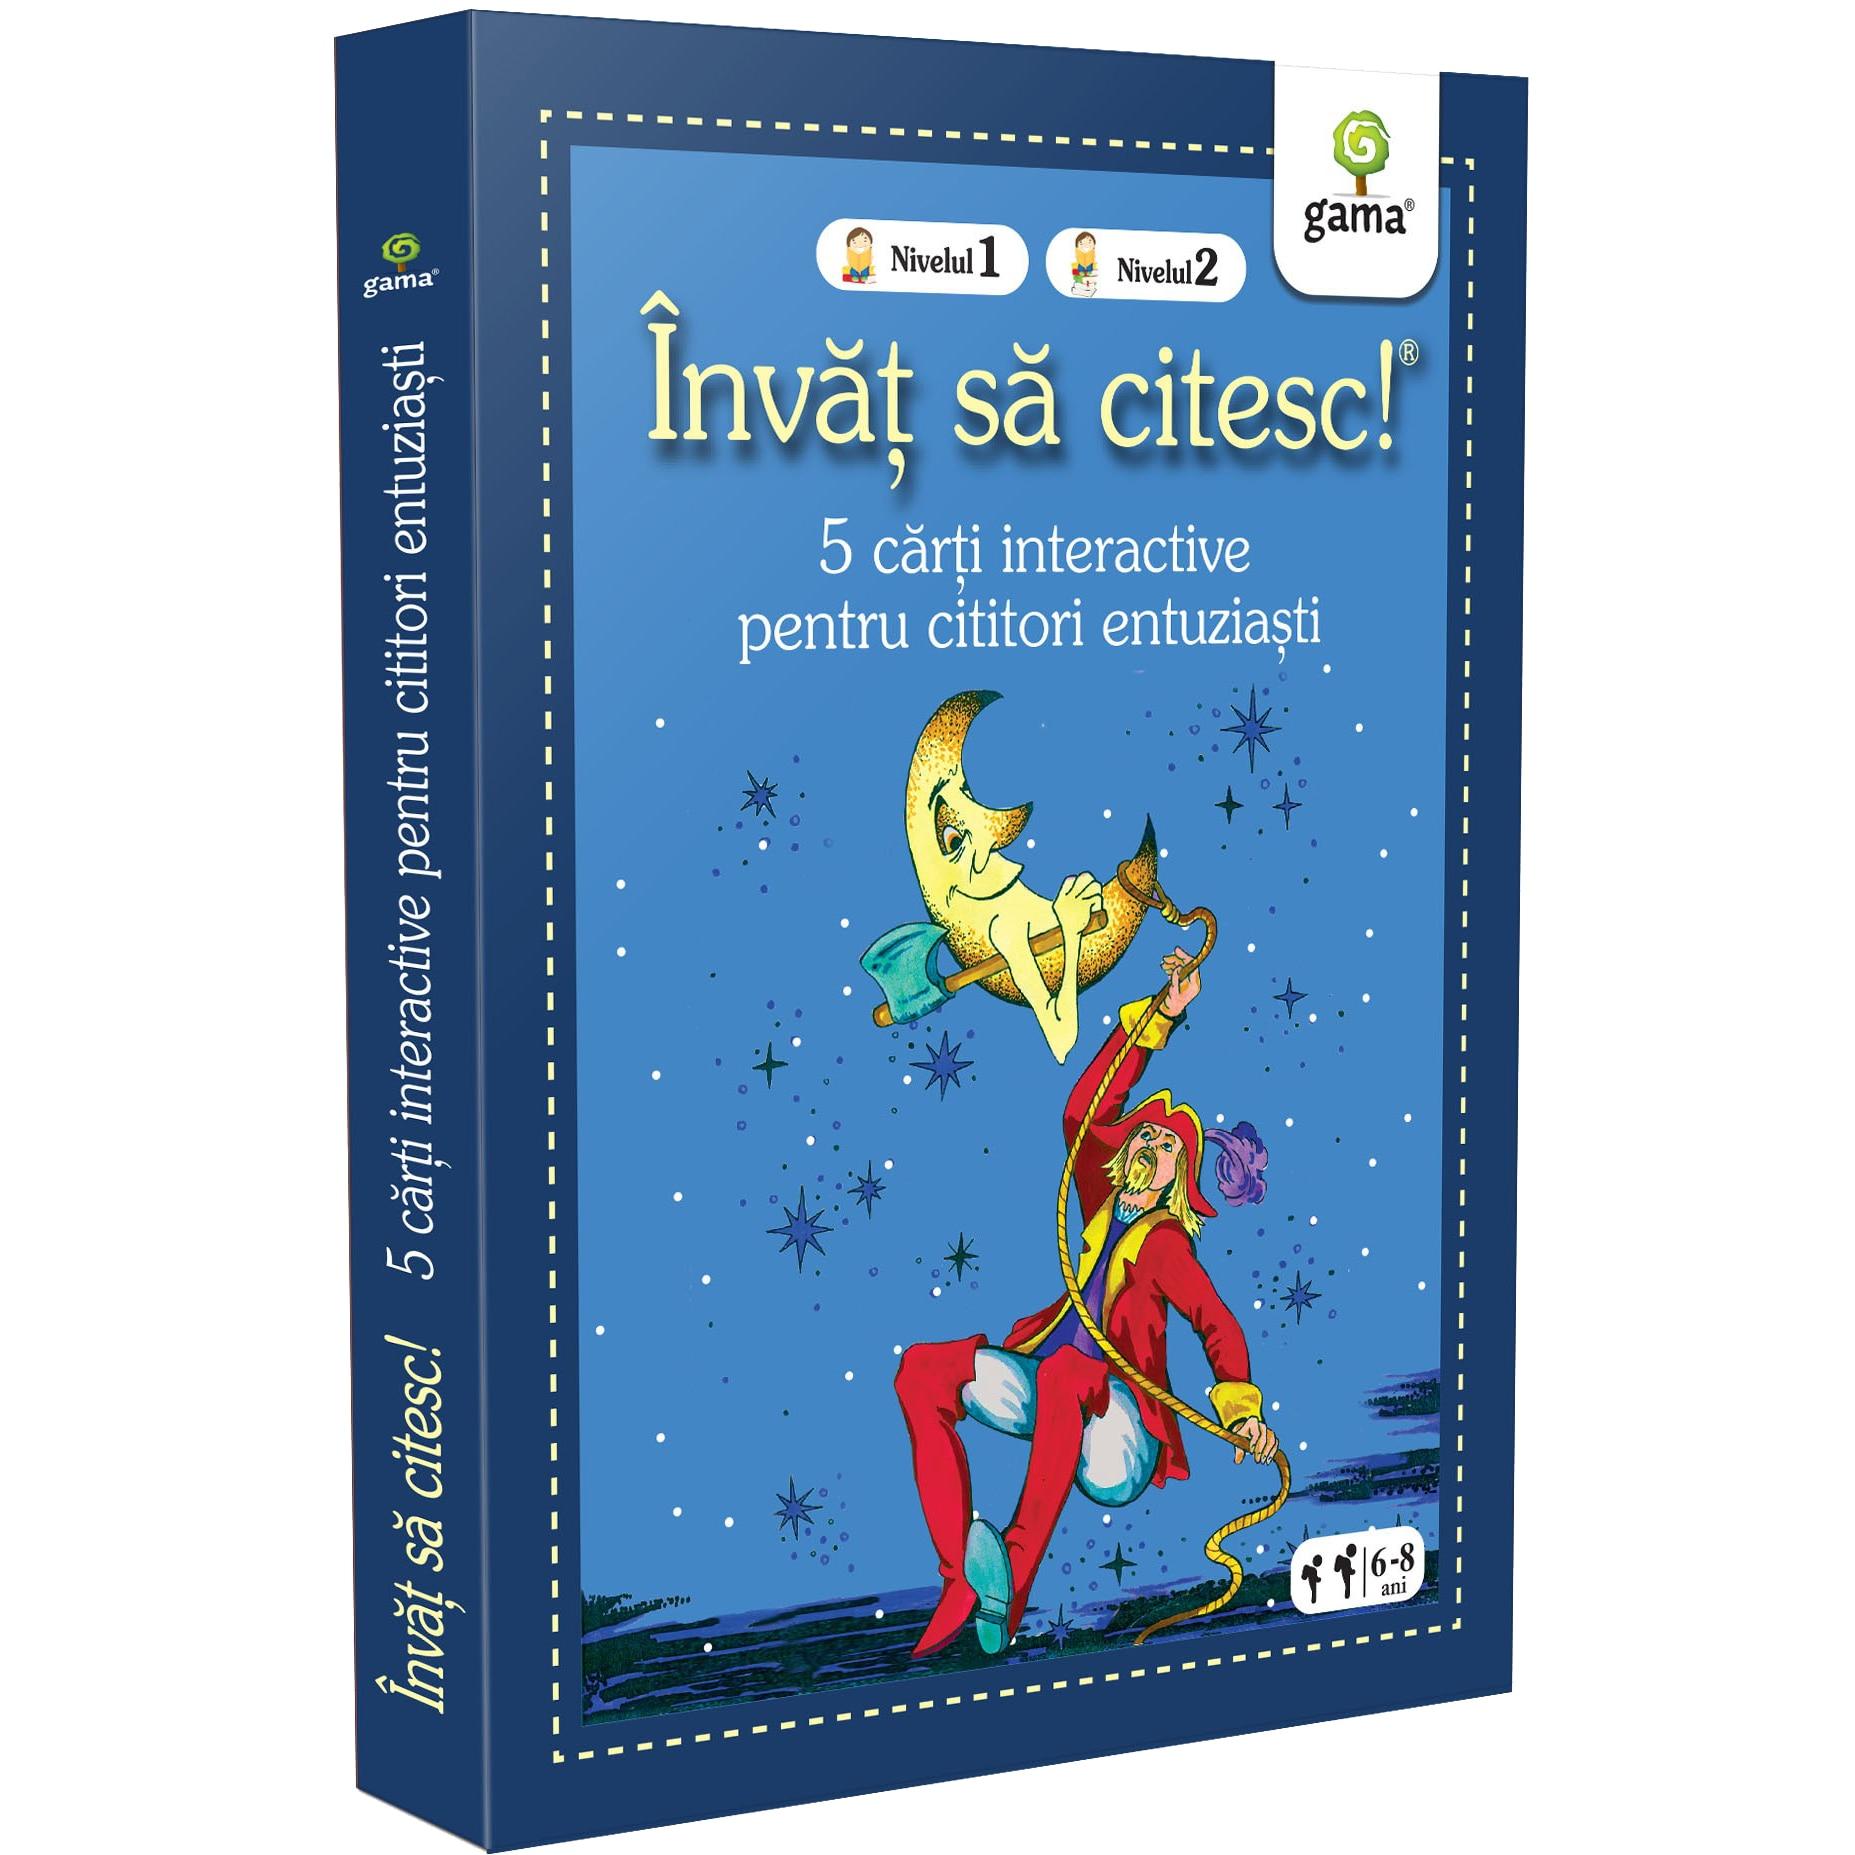 Fotografie Pachet pentru copii, Invat sa citesc pentru cititorii incepatori, 6-8 ani, vol.2, 5 carti